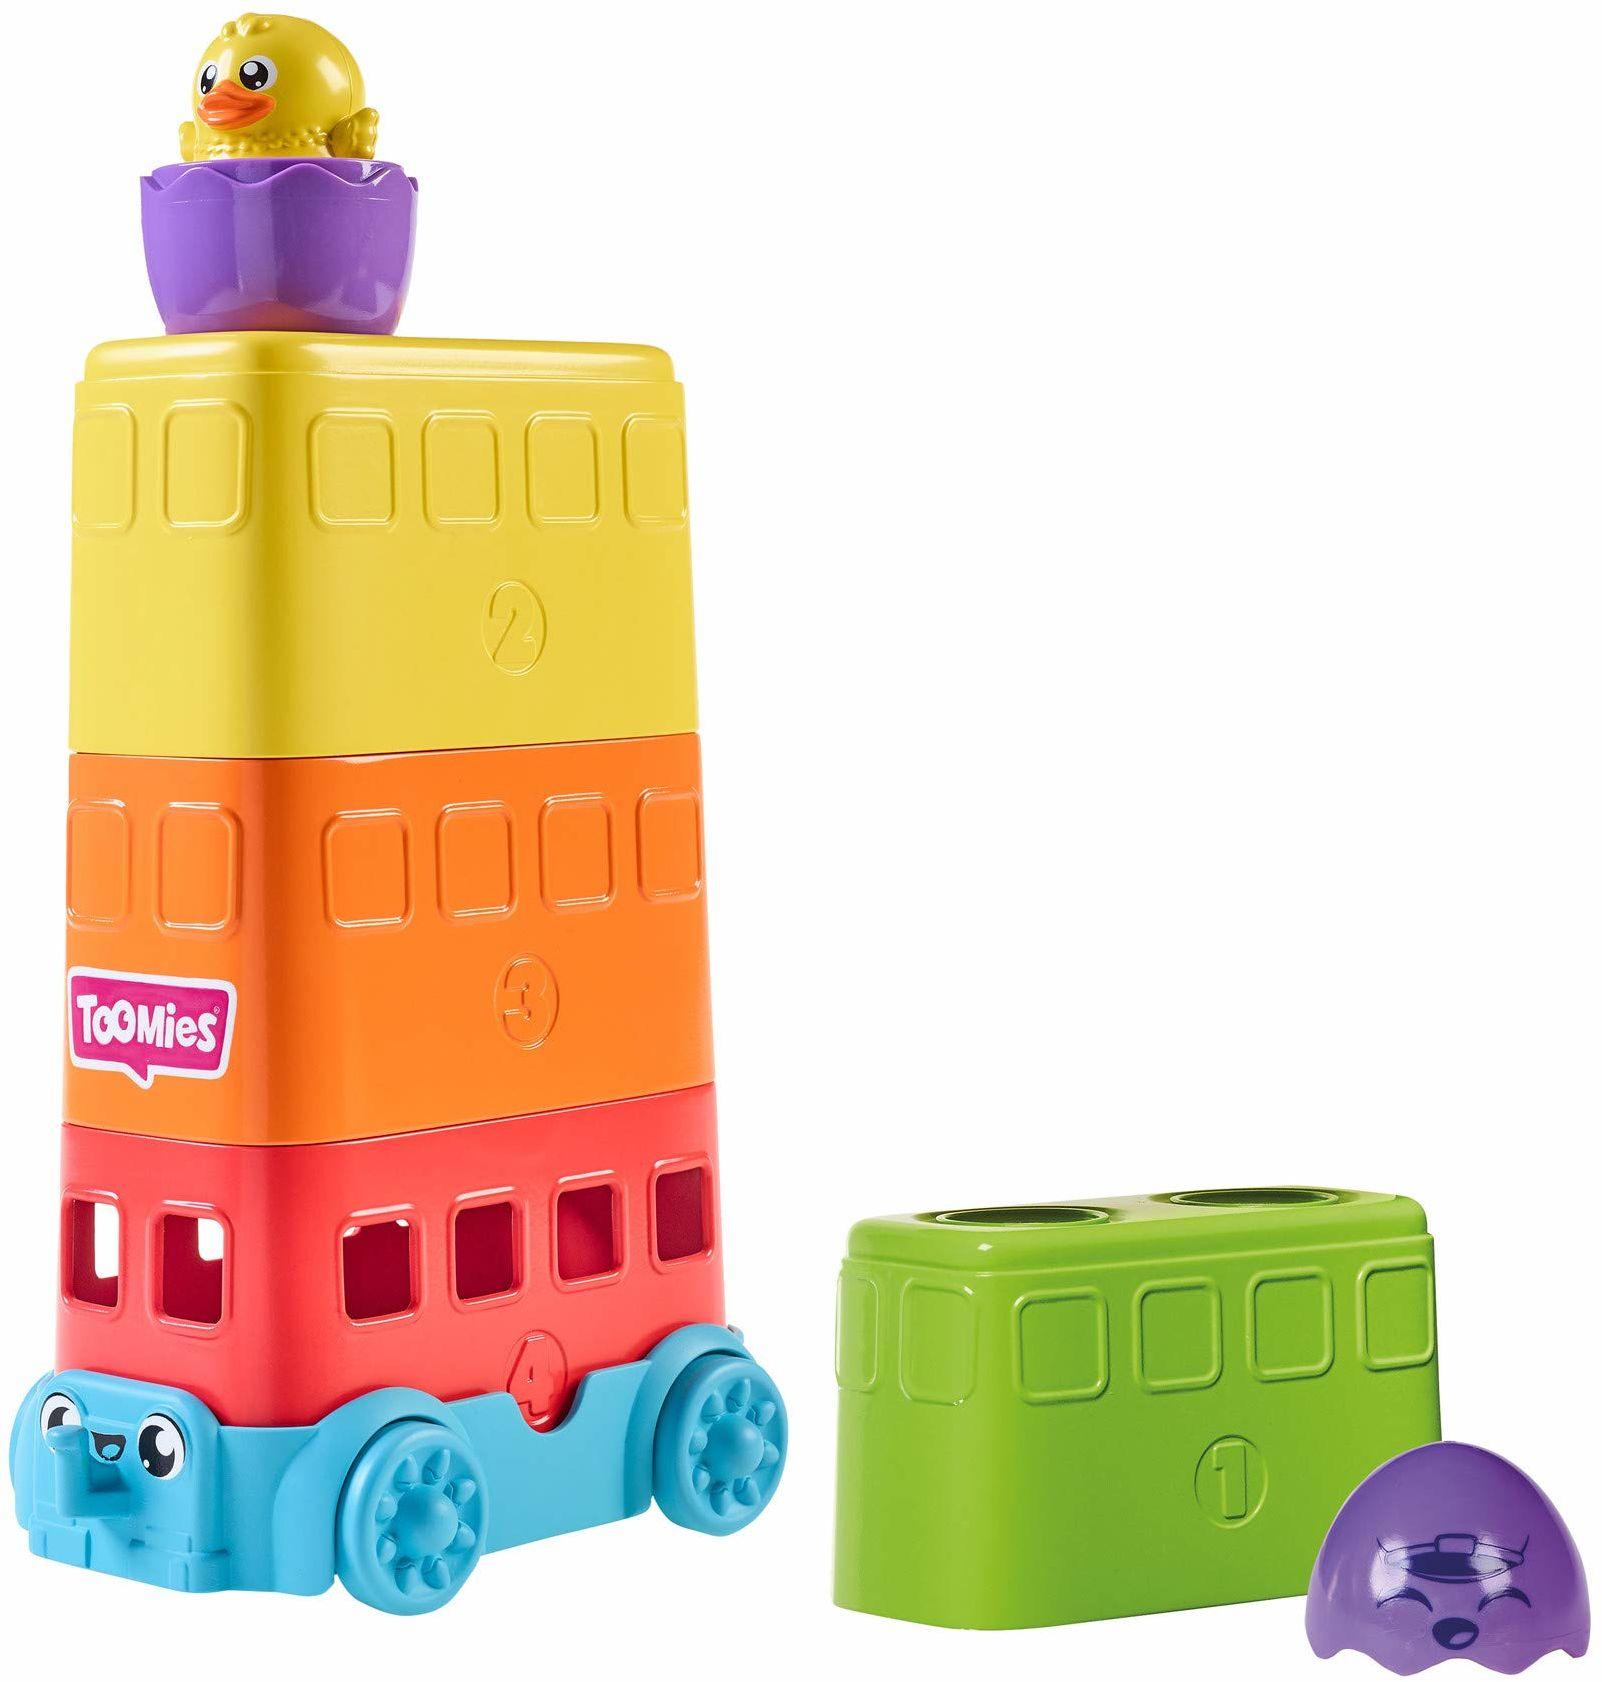 TOOMIES (D3RB1) E73220C traktor zabawkowy